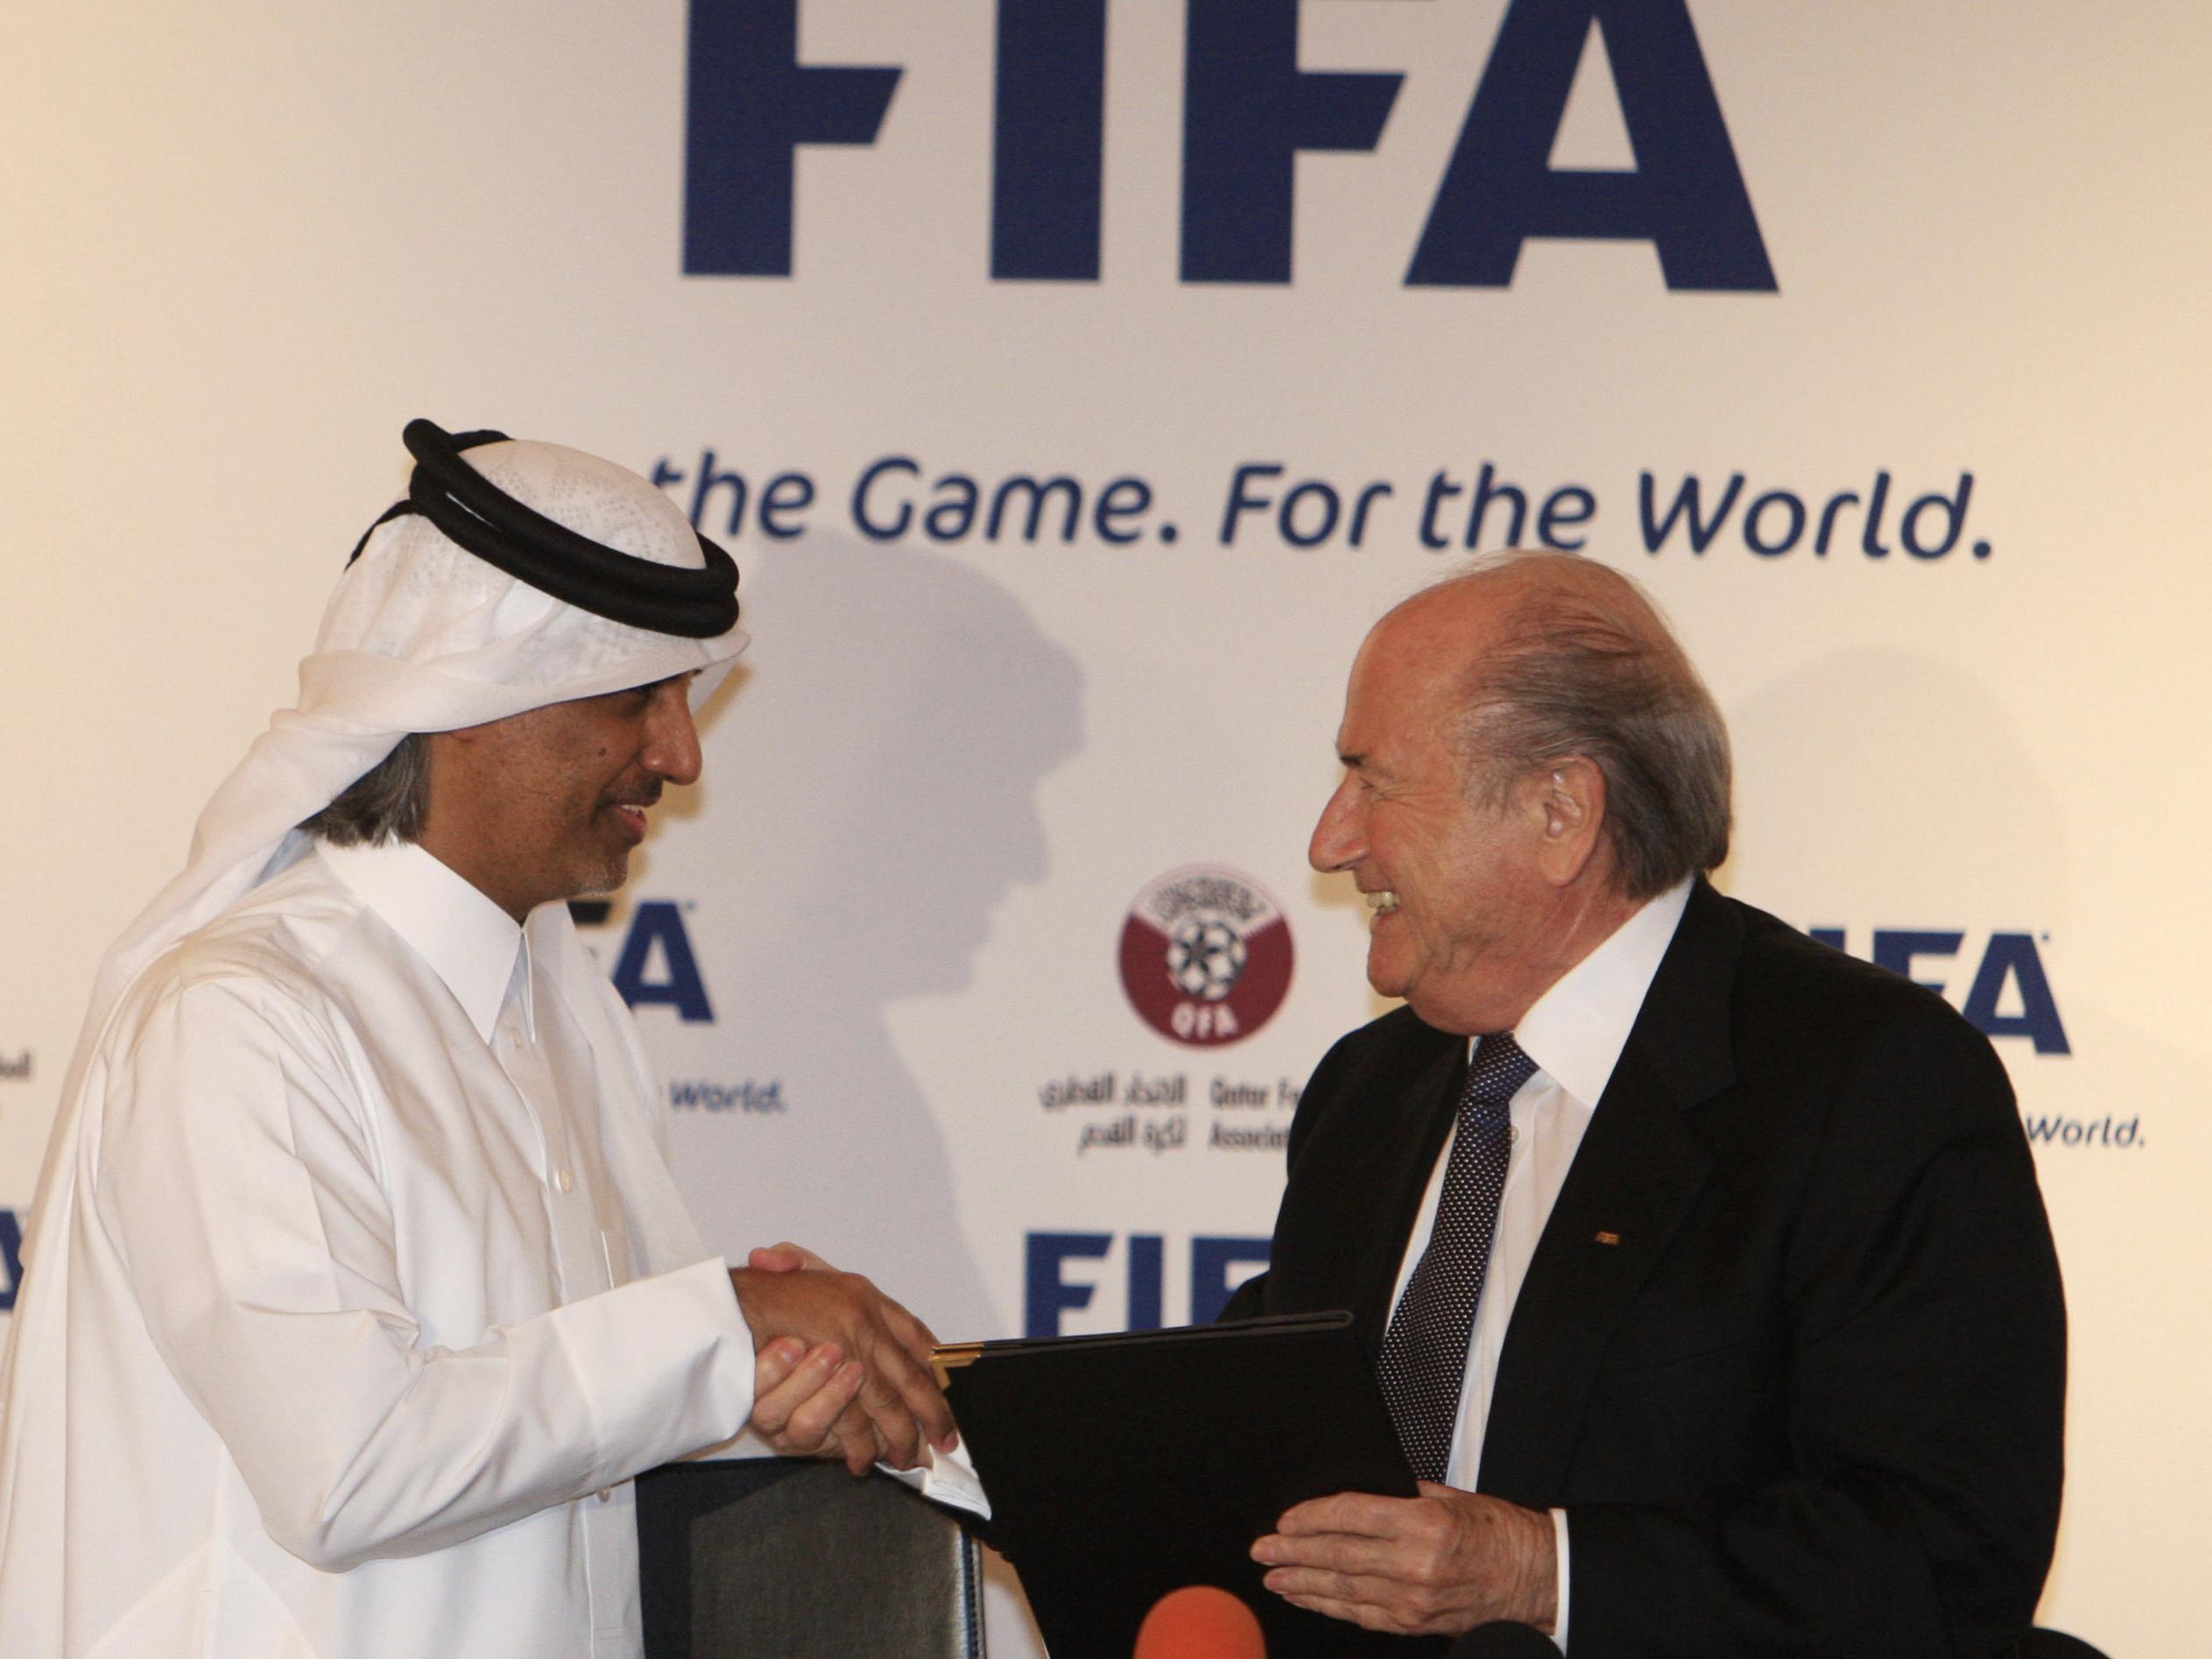 FIFA Clears Qatar, Russia Of World Cup Corruption, Ignites Furor